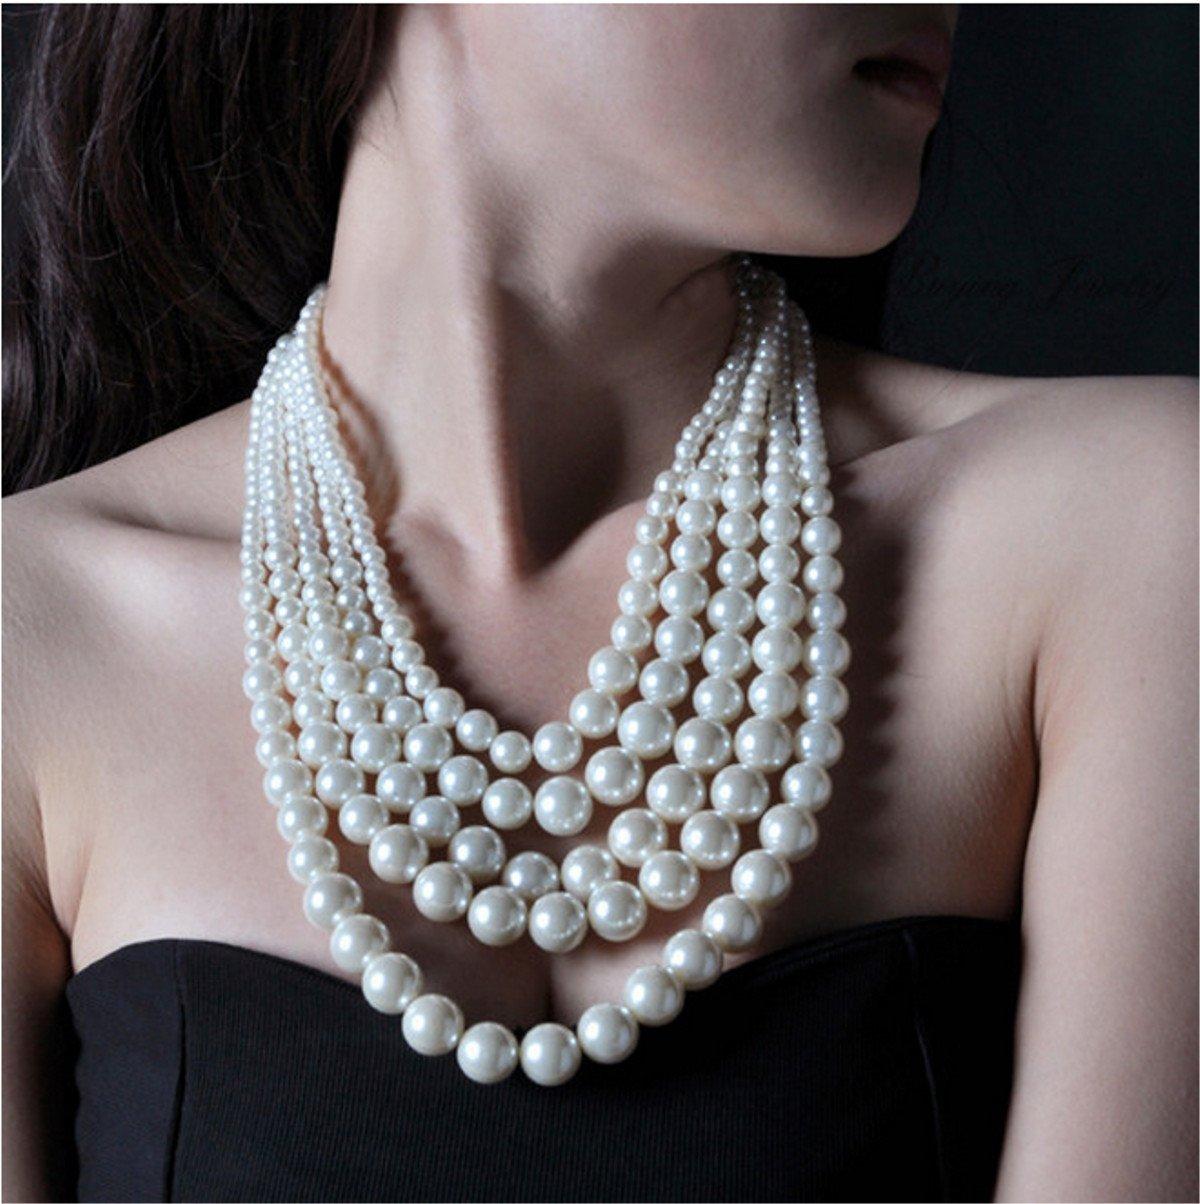 Multilayer 5-Strand Creamy White Pearl Fashion Choker Necklace